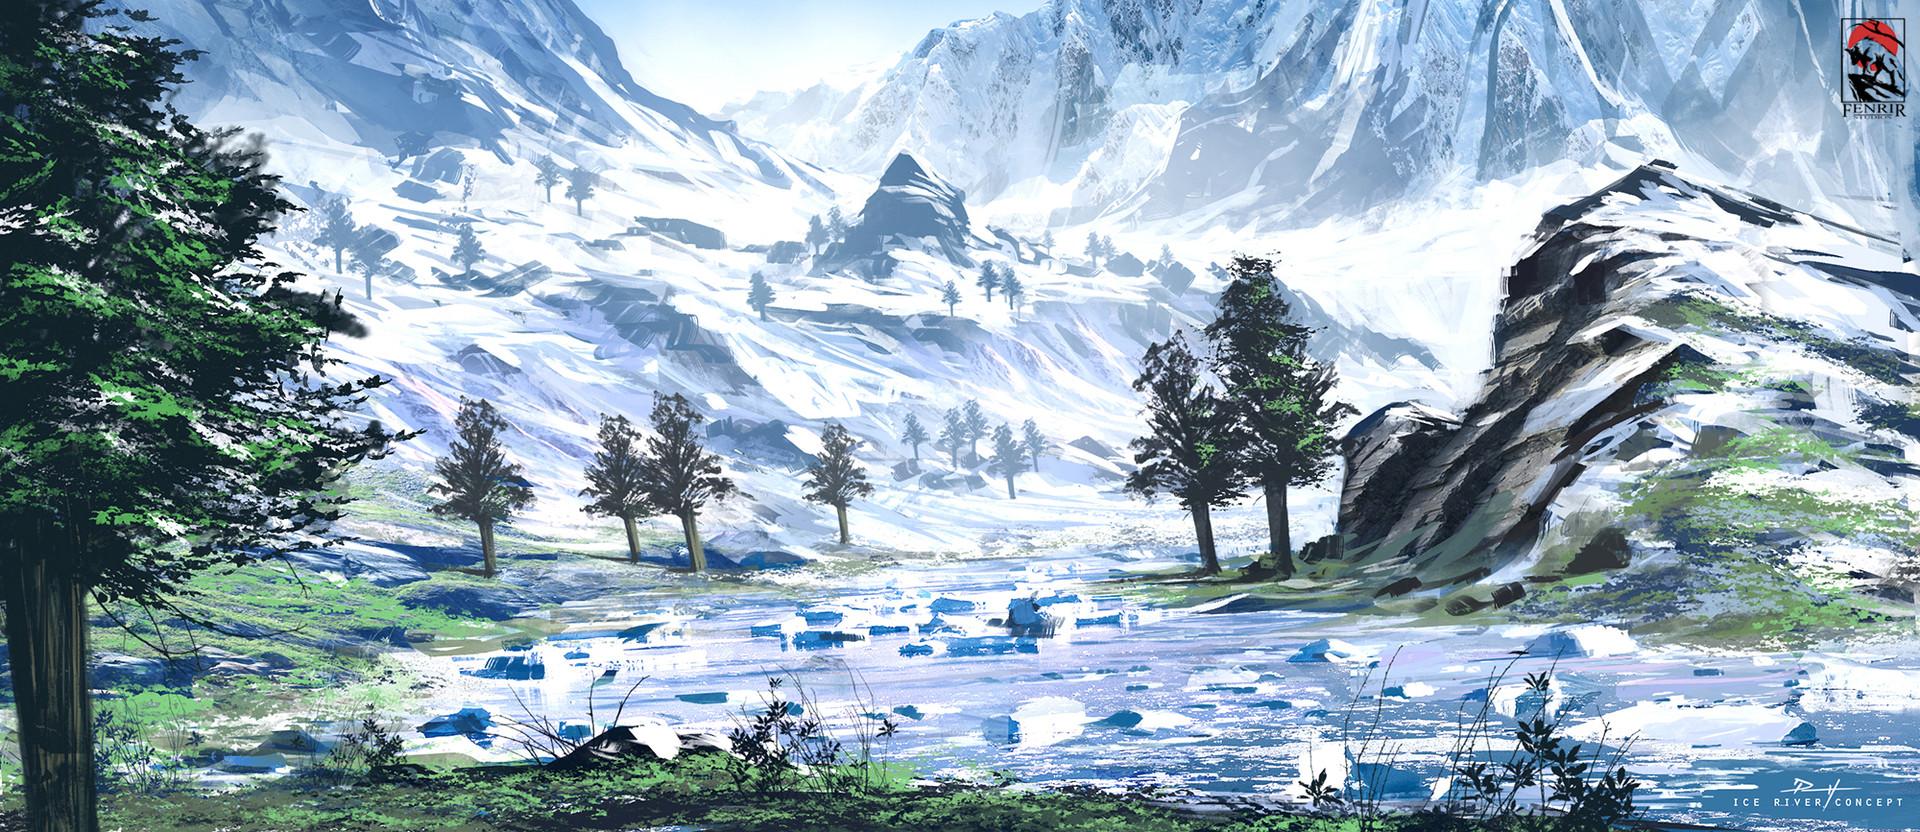 Daniel pellow ice river2